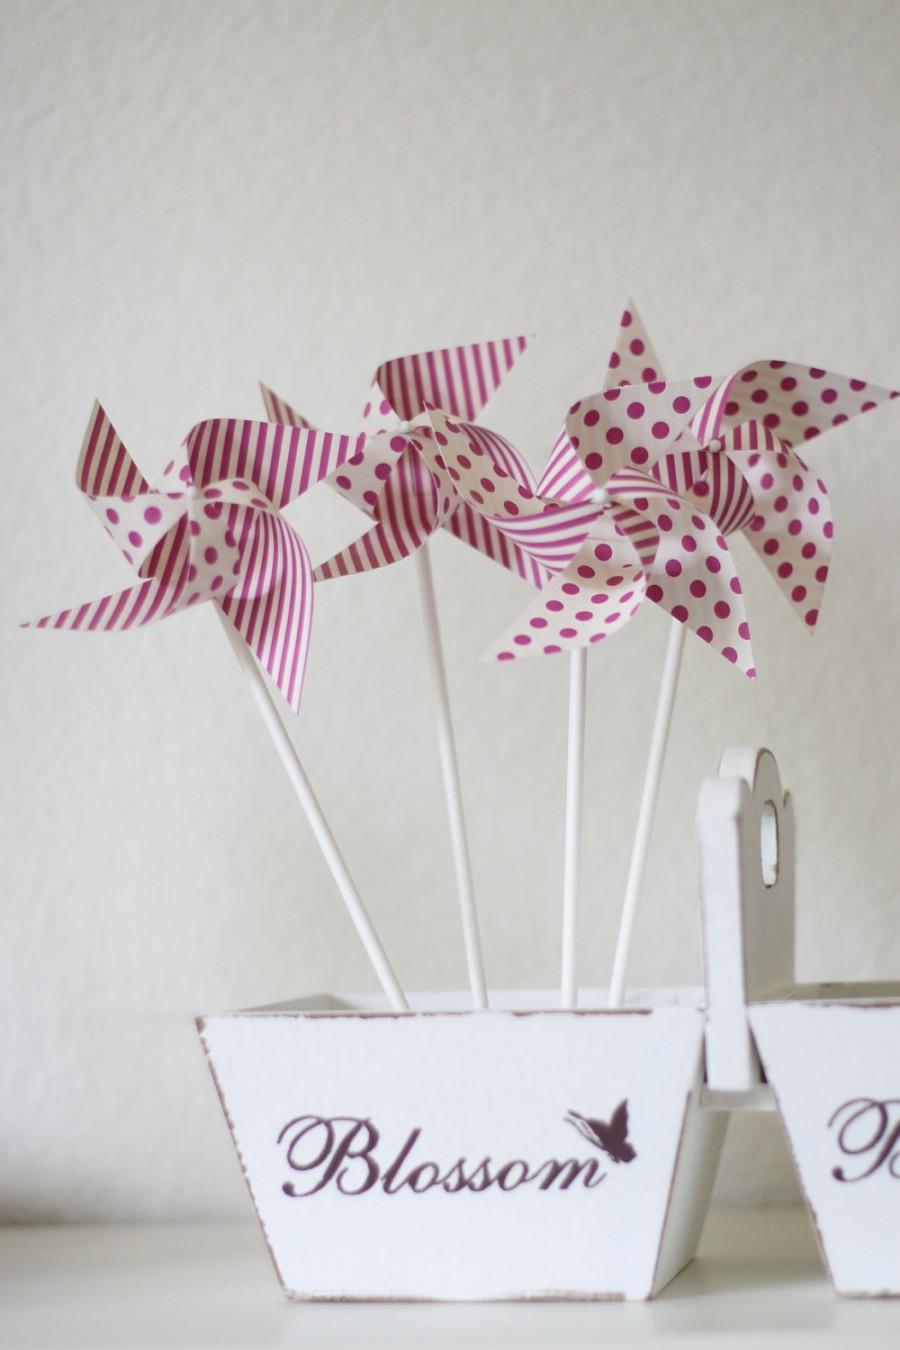 Wedding - Escort cards Favor Polka Dot and Stipes Pinwheels Wedding Favor 12 Mini Spinnable Pinwheels (custom orders welcomed)